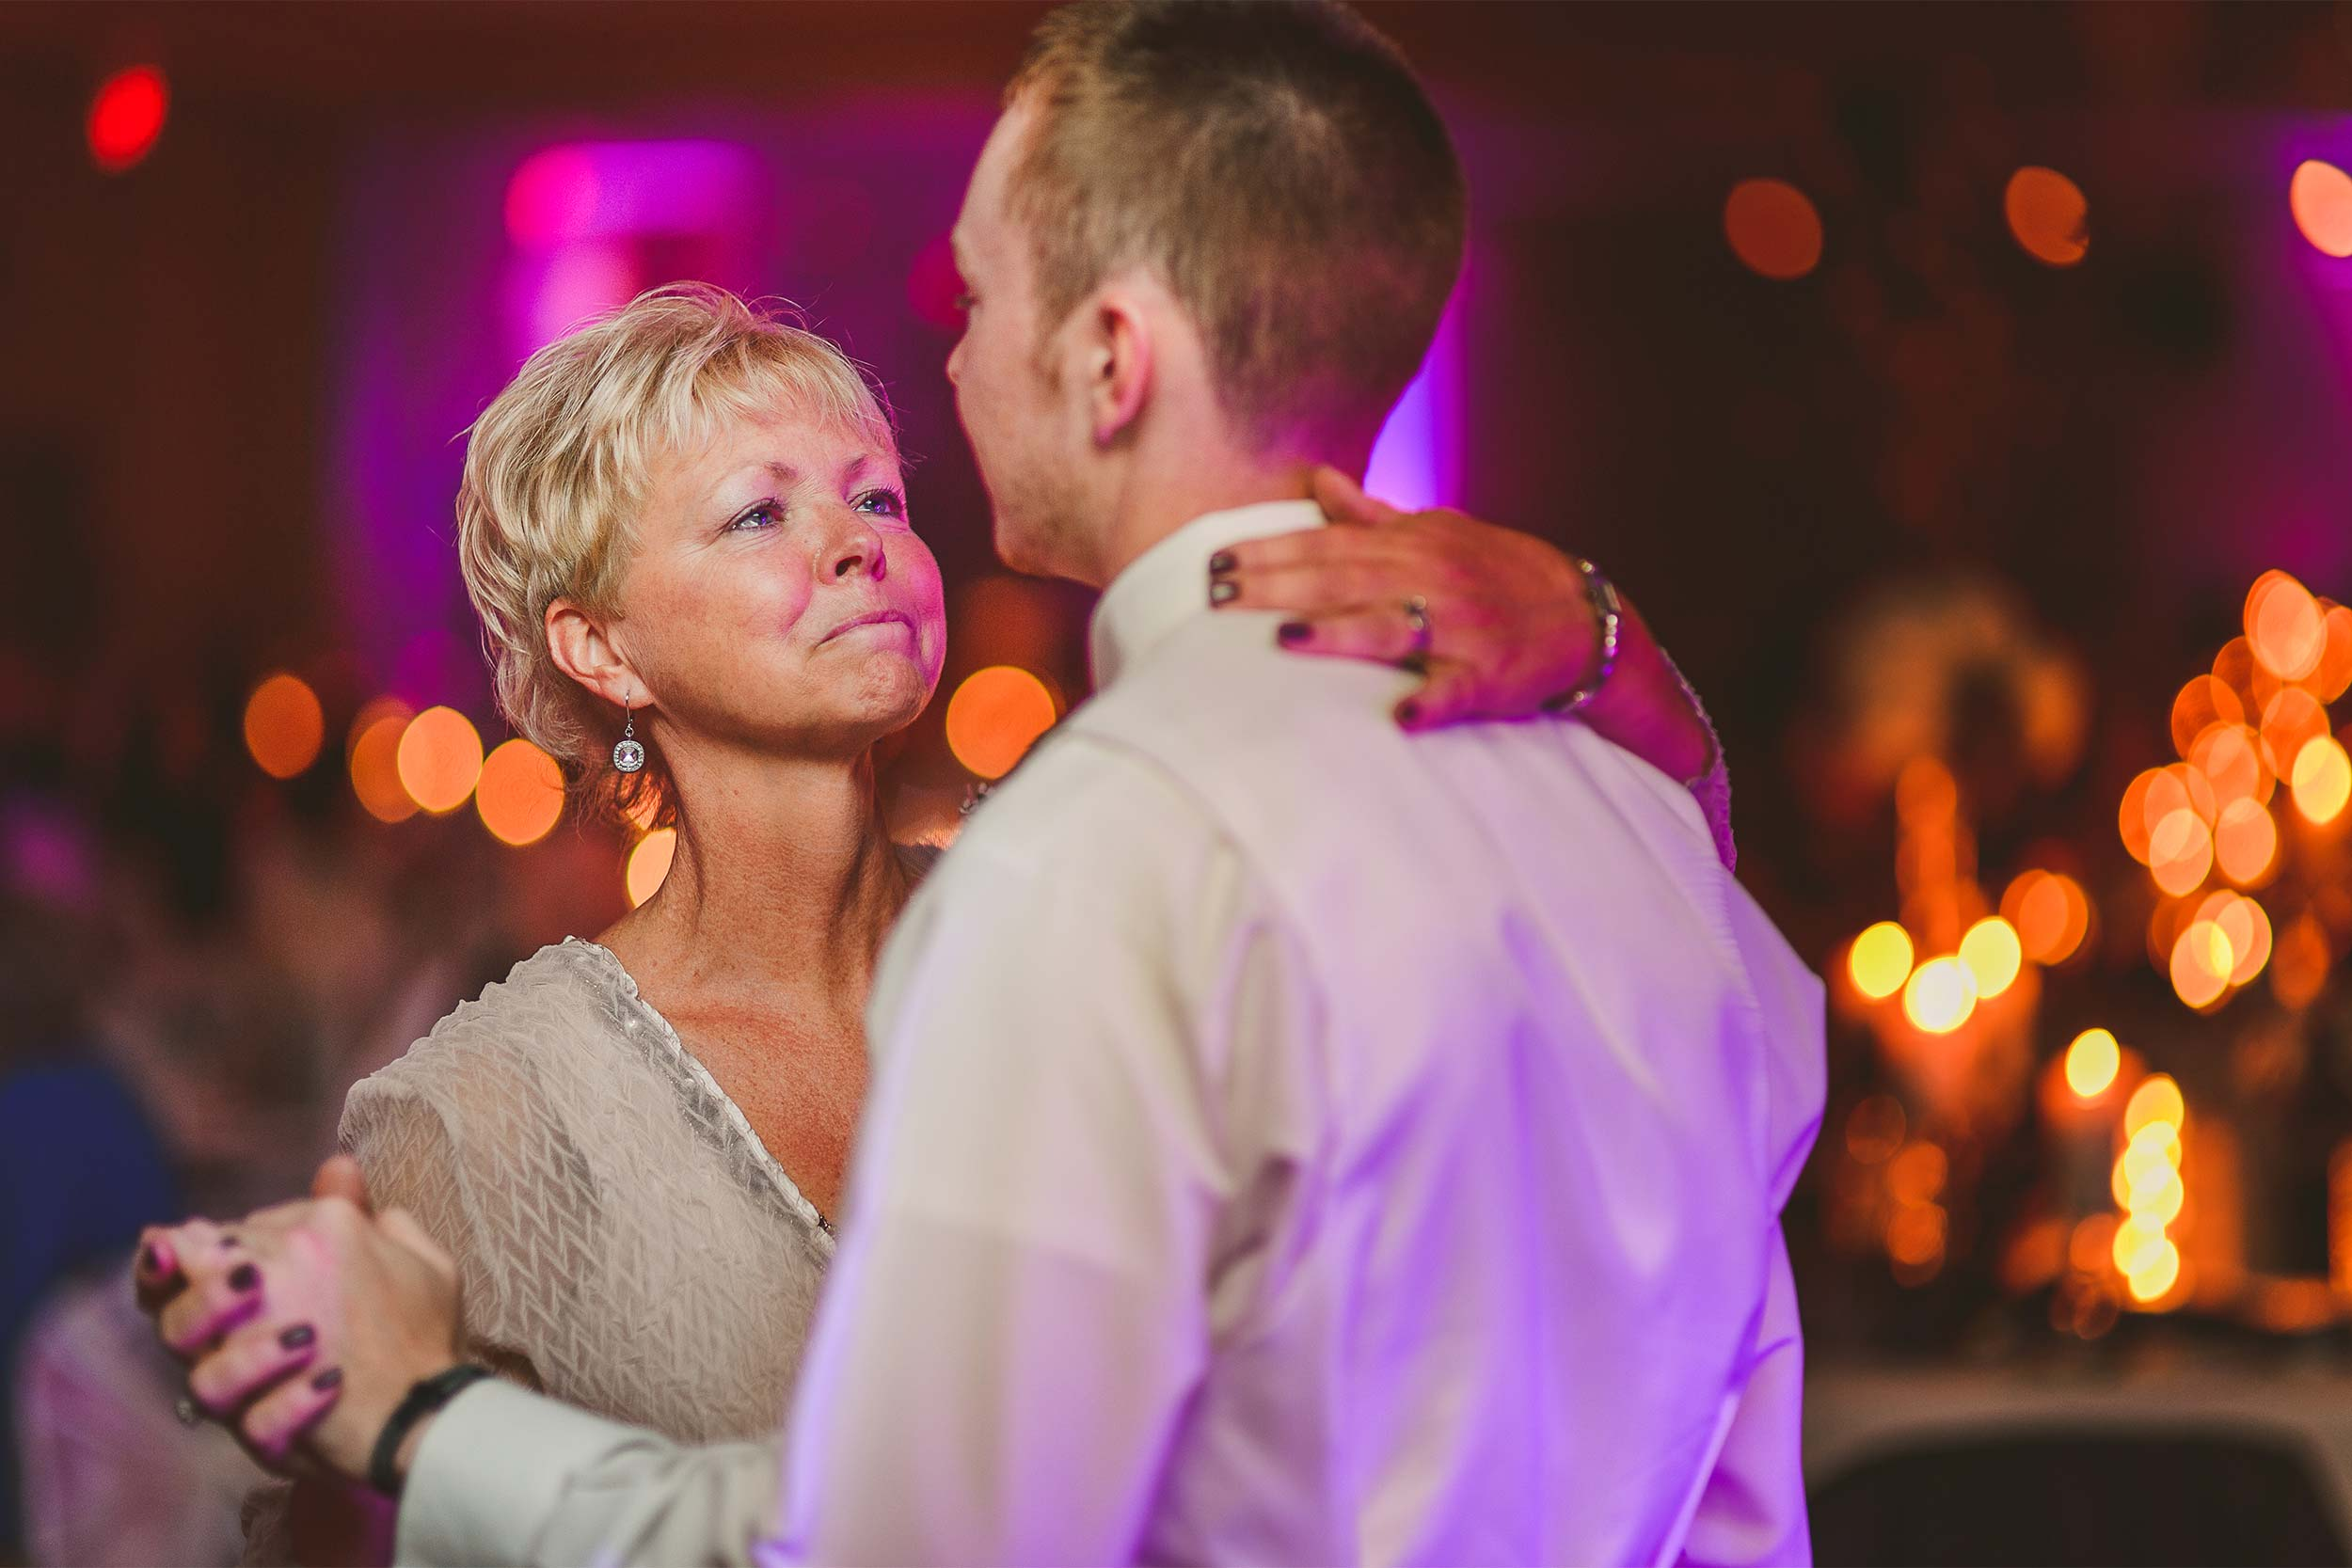 emotional-wedding-dance-mother-son.jpg